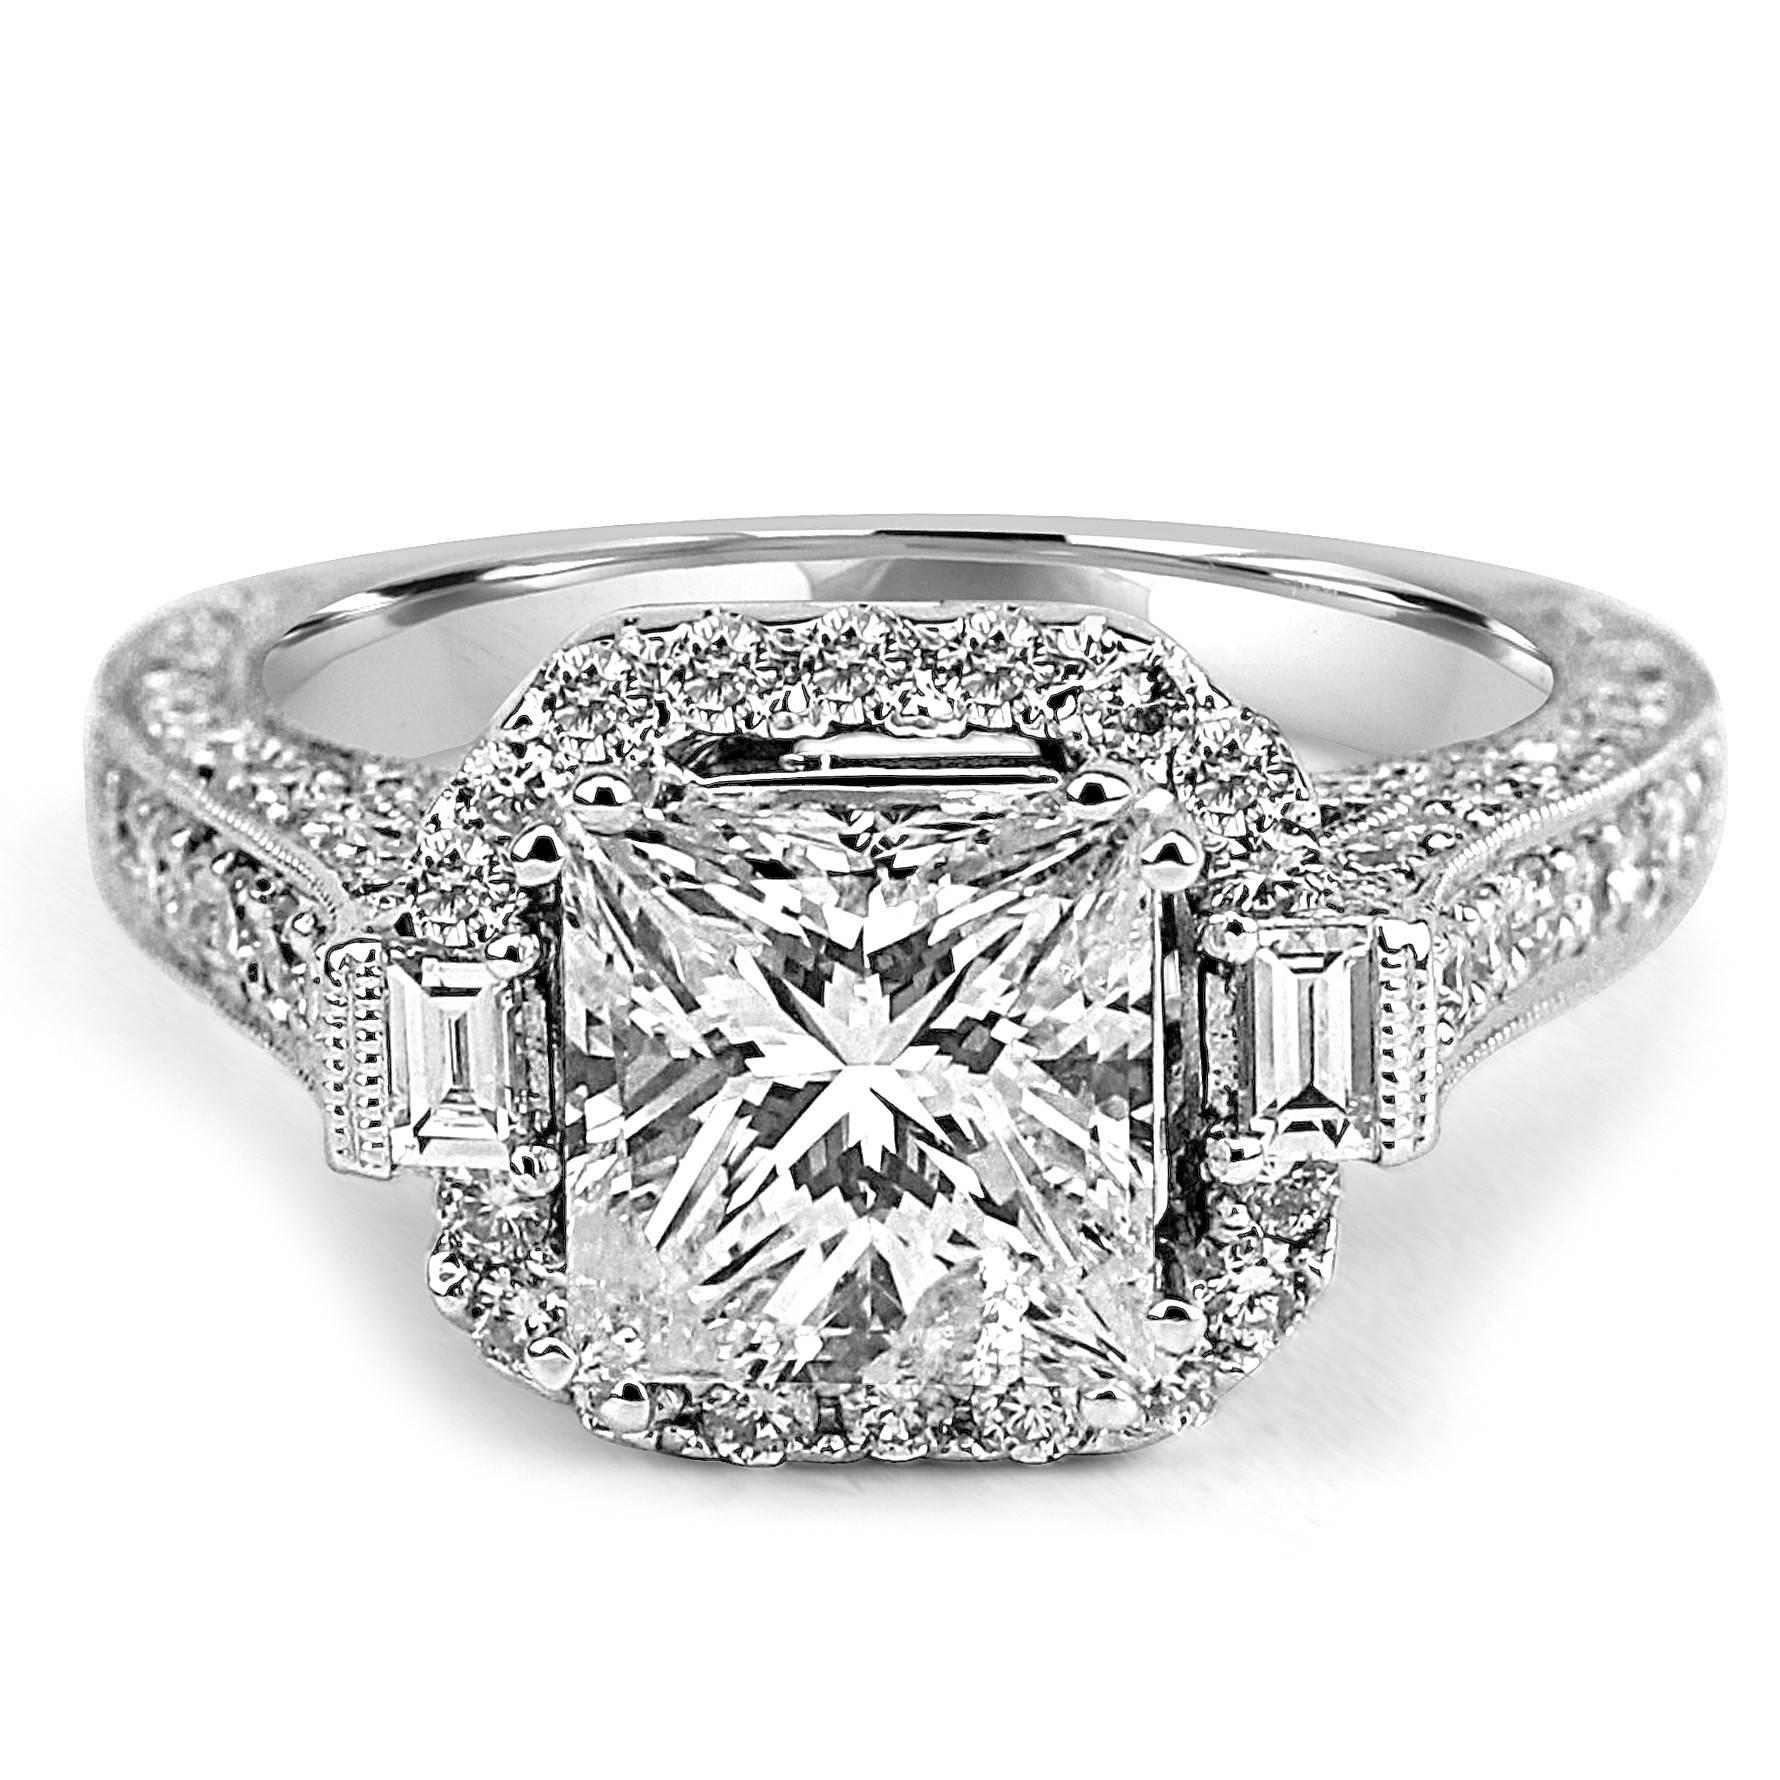 Jean Pierre Jewelers In Halo Diamond Wedding Rings (View 15 of 15)